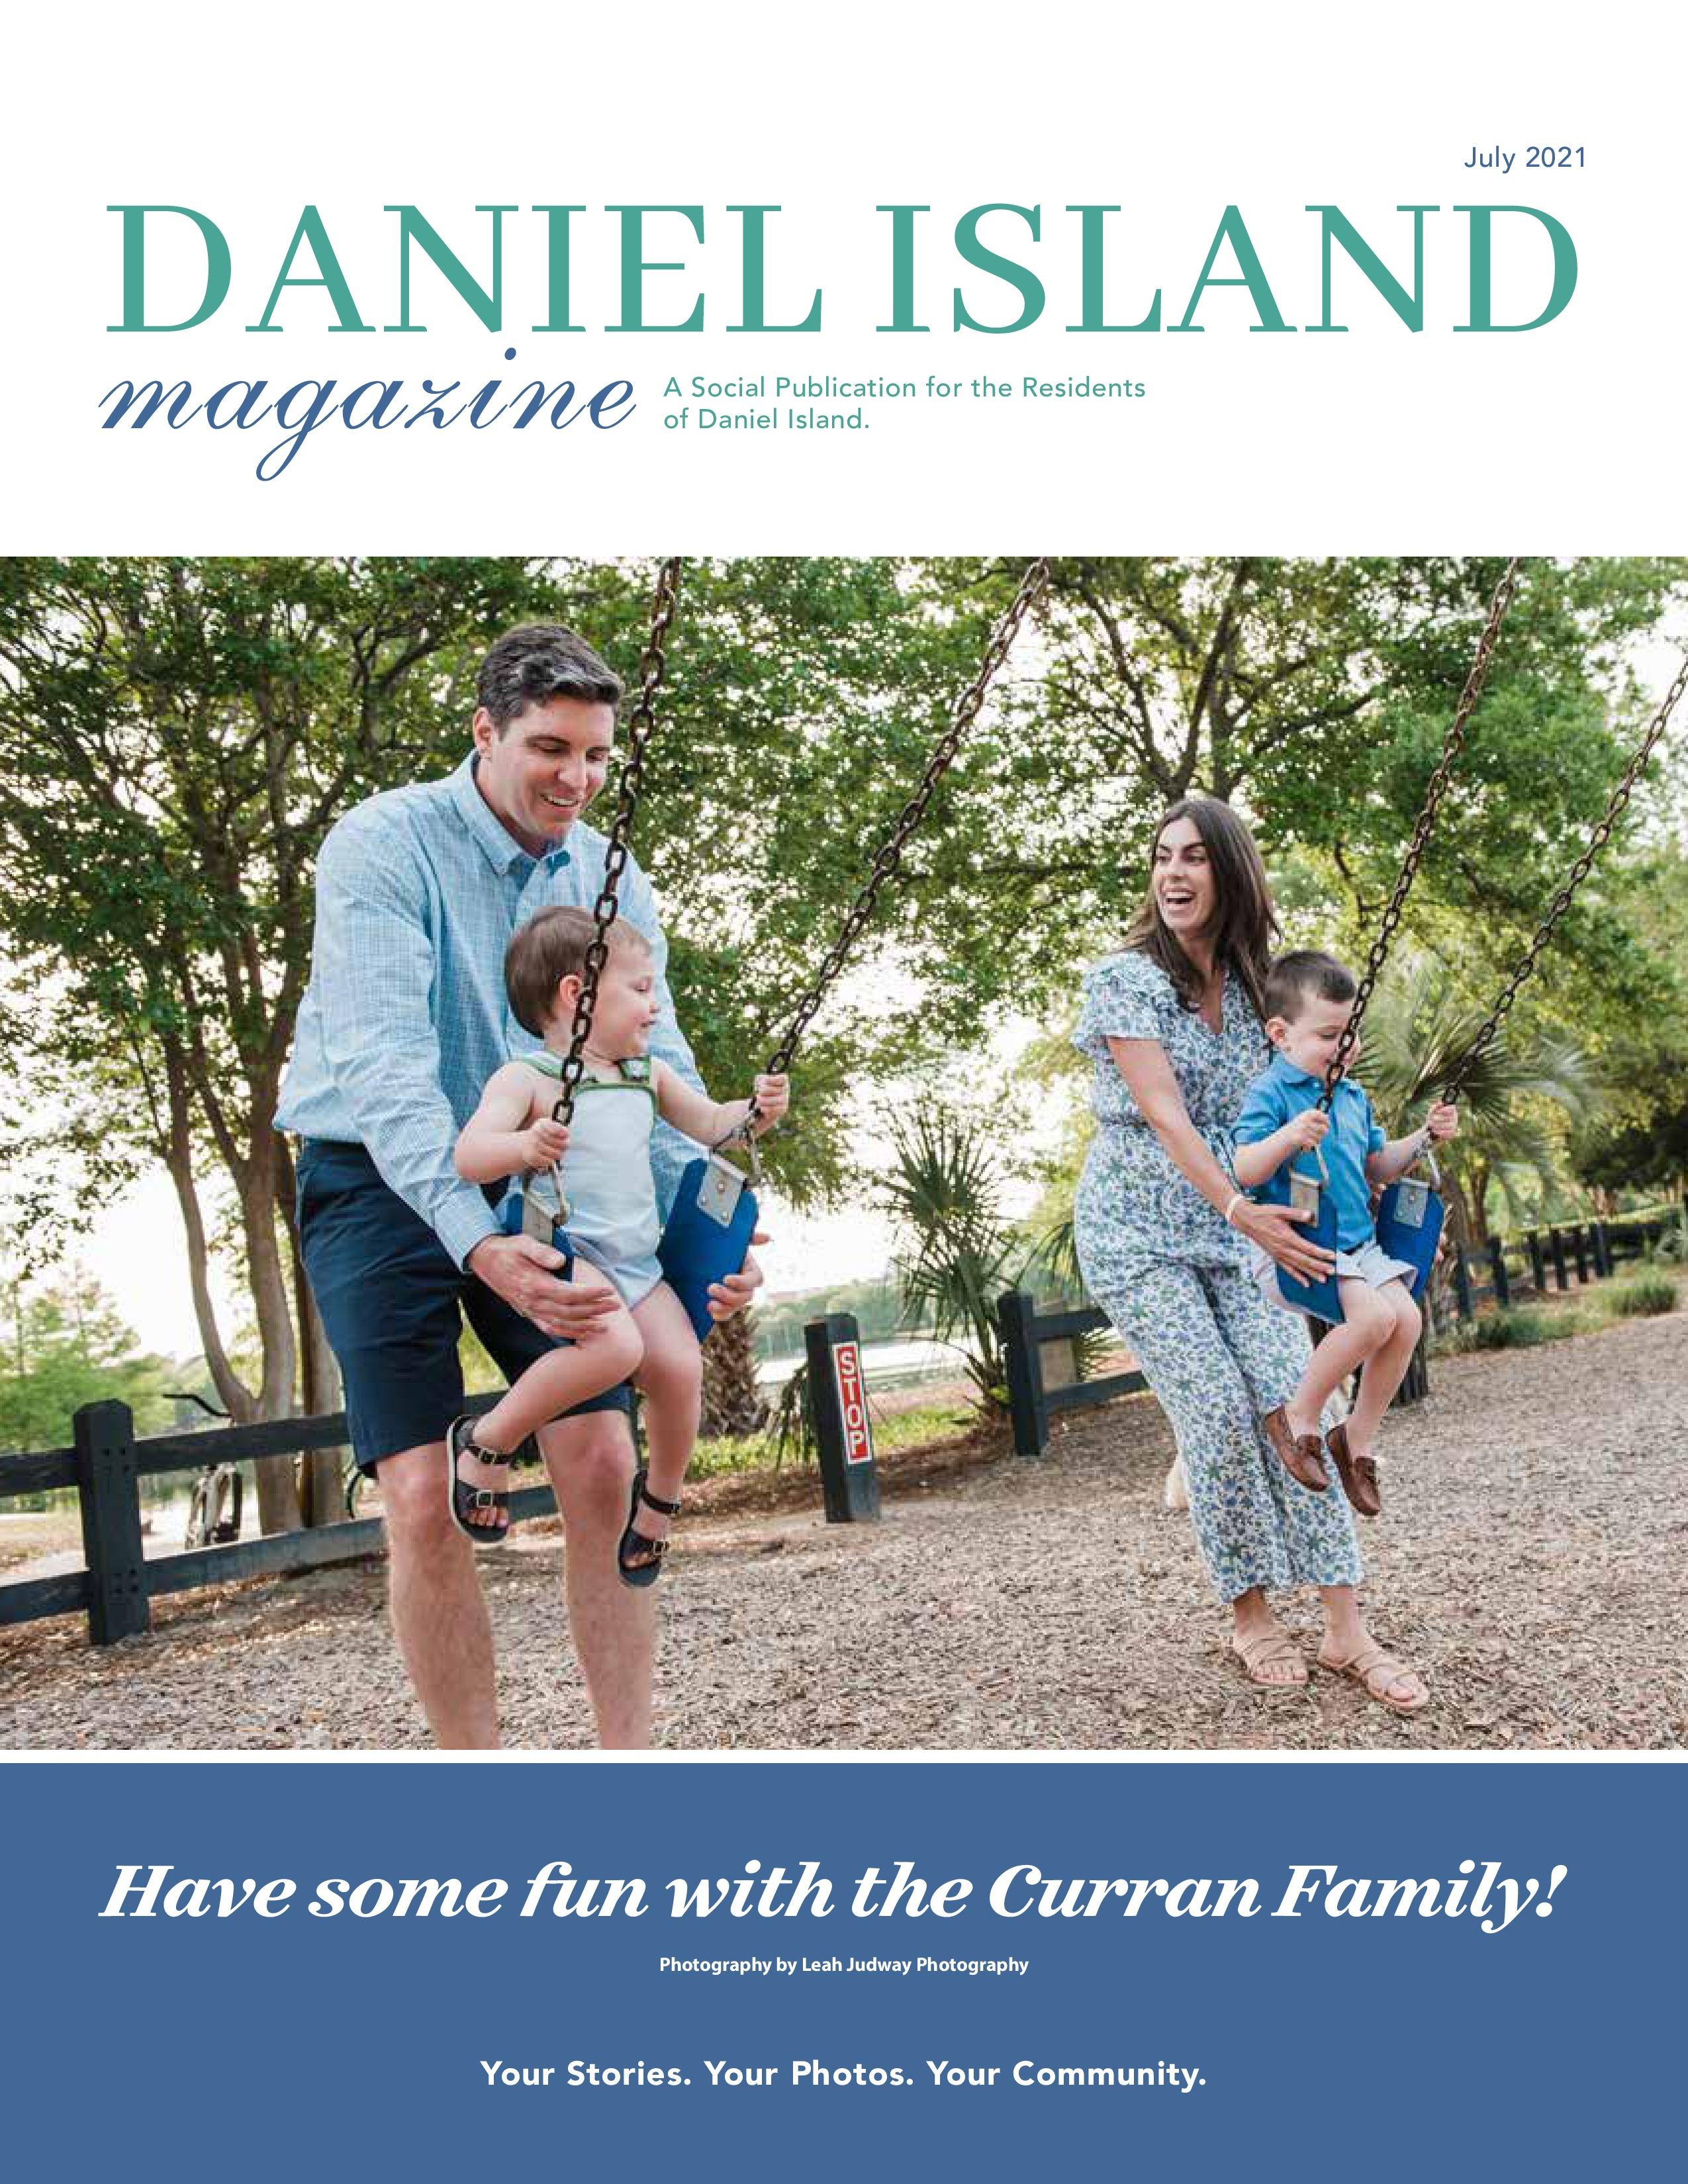 Daniel Island Magazine 2021-07-01